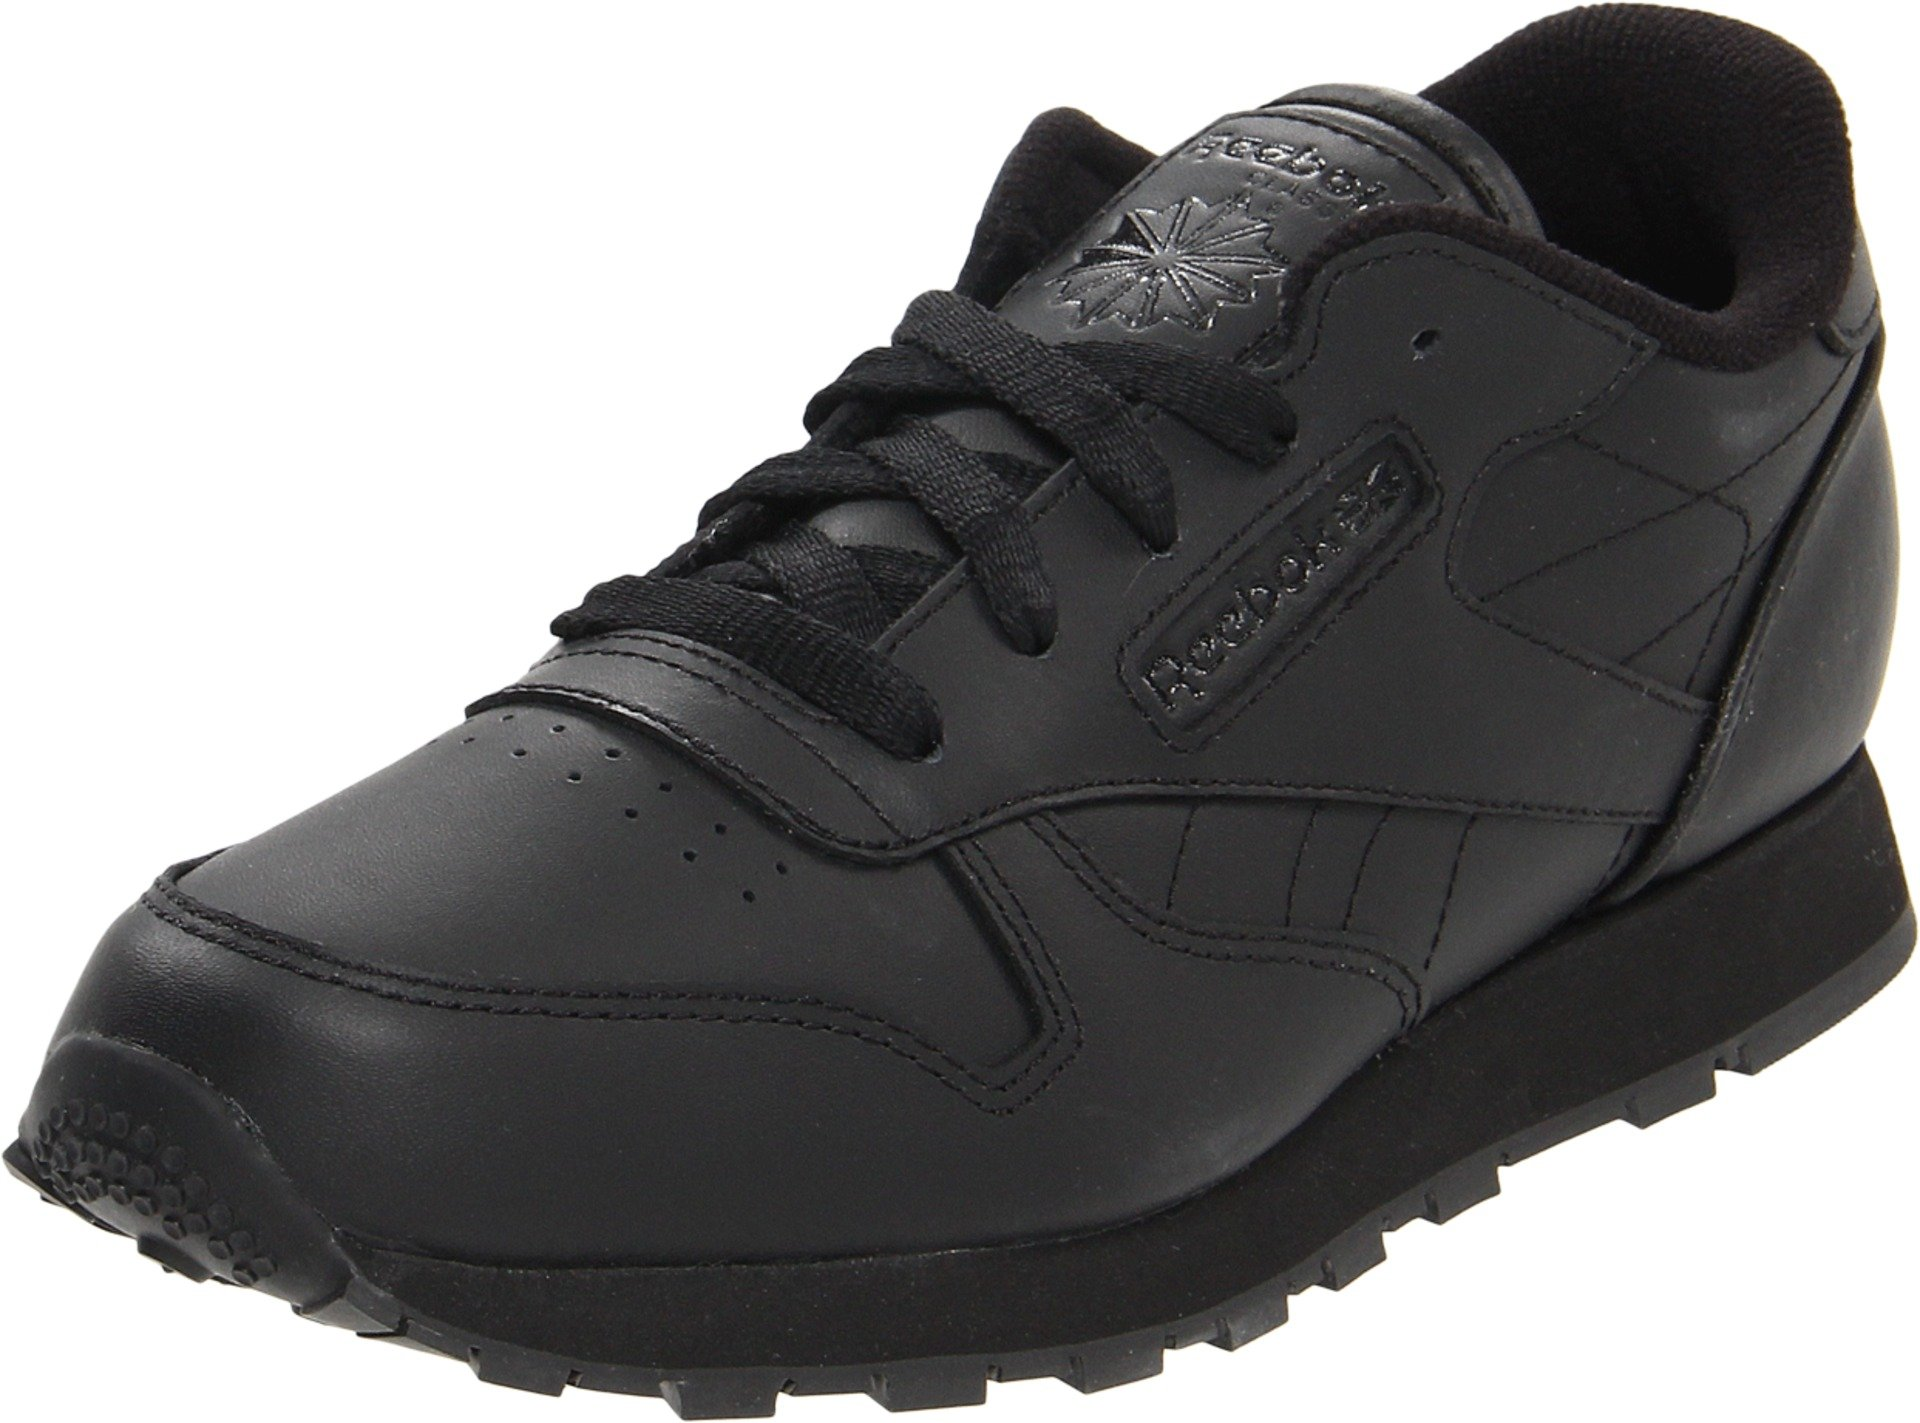 Reebok Classic Leather Shoe,Black/Black/Black,11.5 M US Little Kid by Reebok (Image #1)